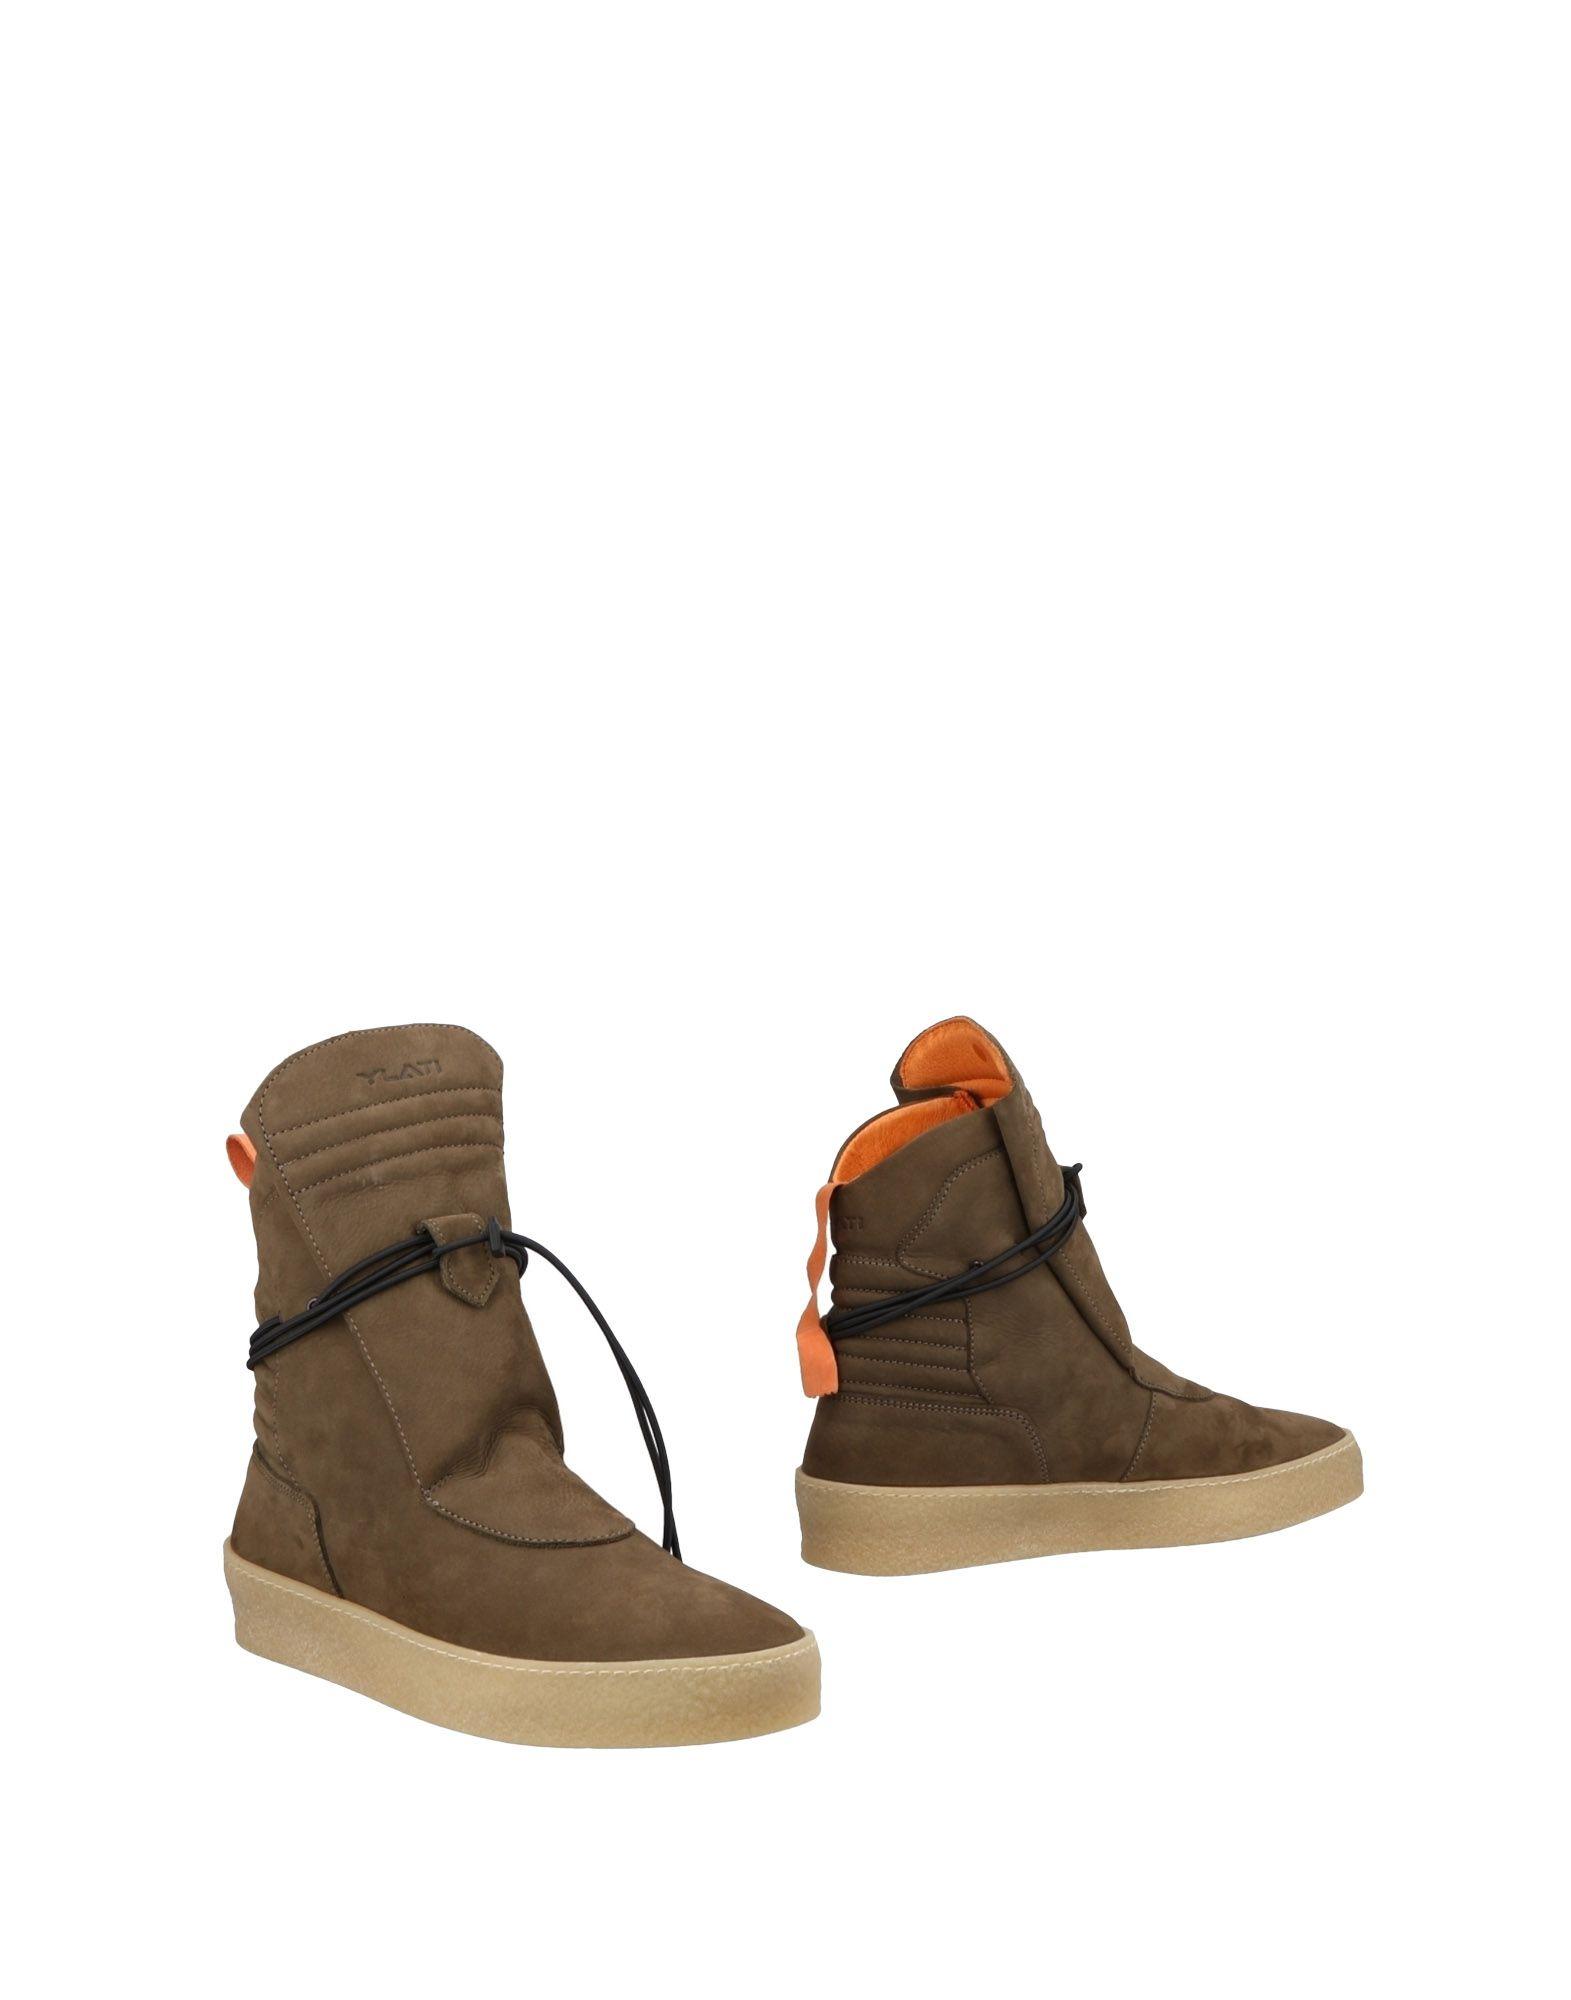 Ylati Stiefelette Herren  Schuhe 11479201JL Gute Qualität beliebte Schuhe  84e25e